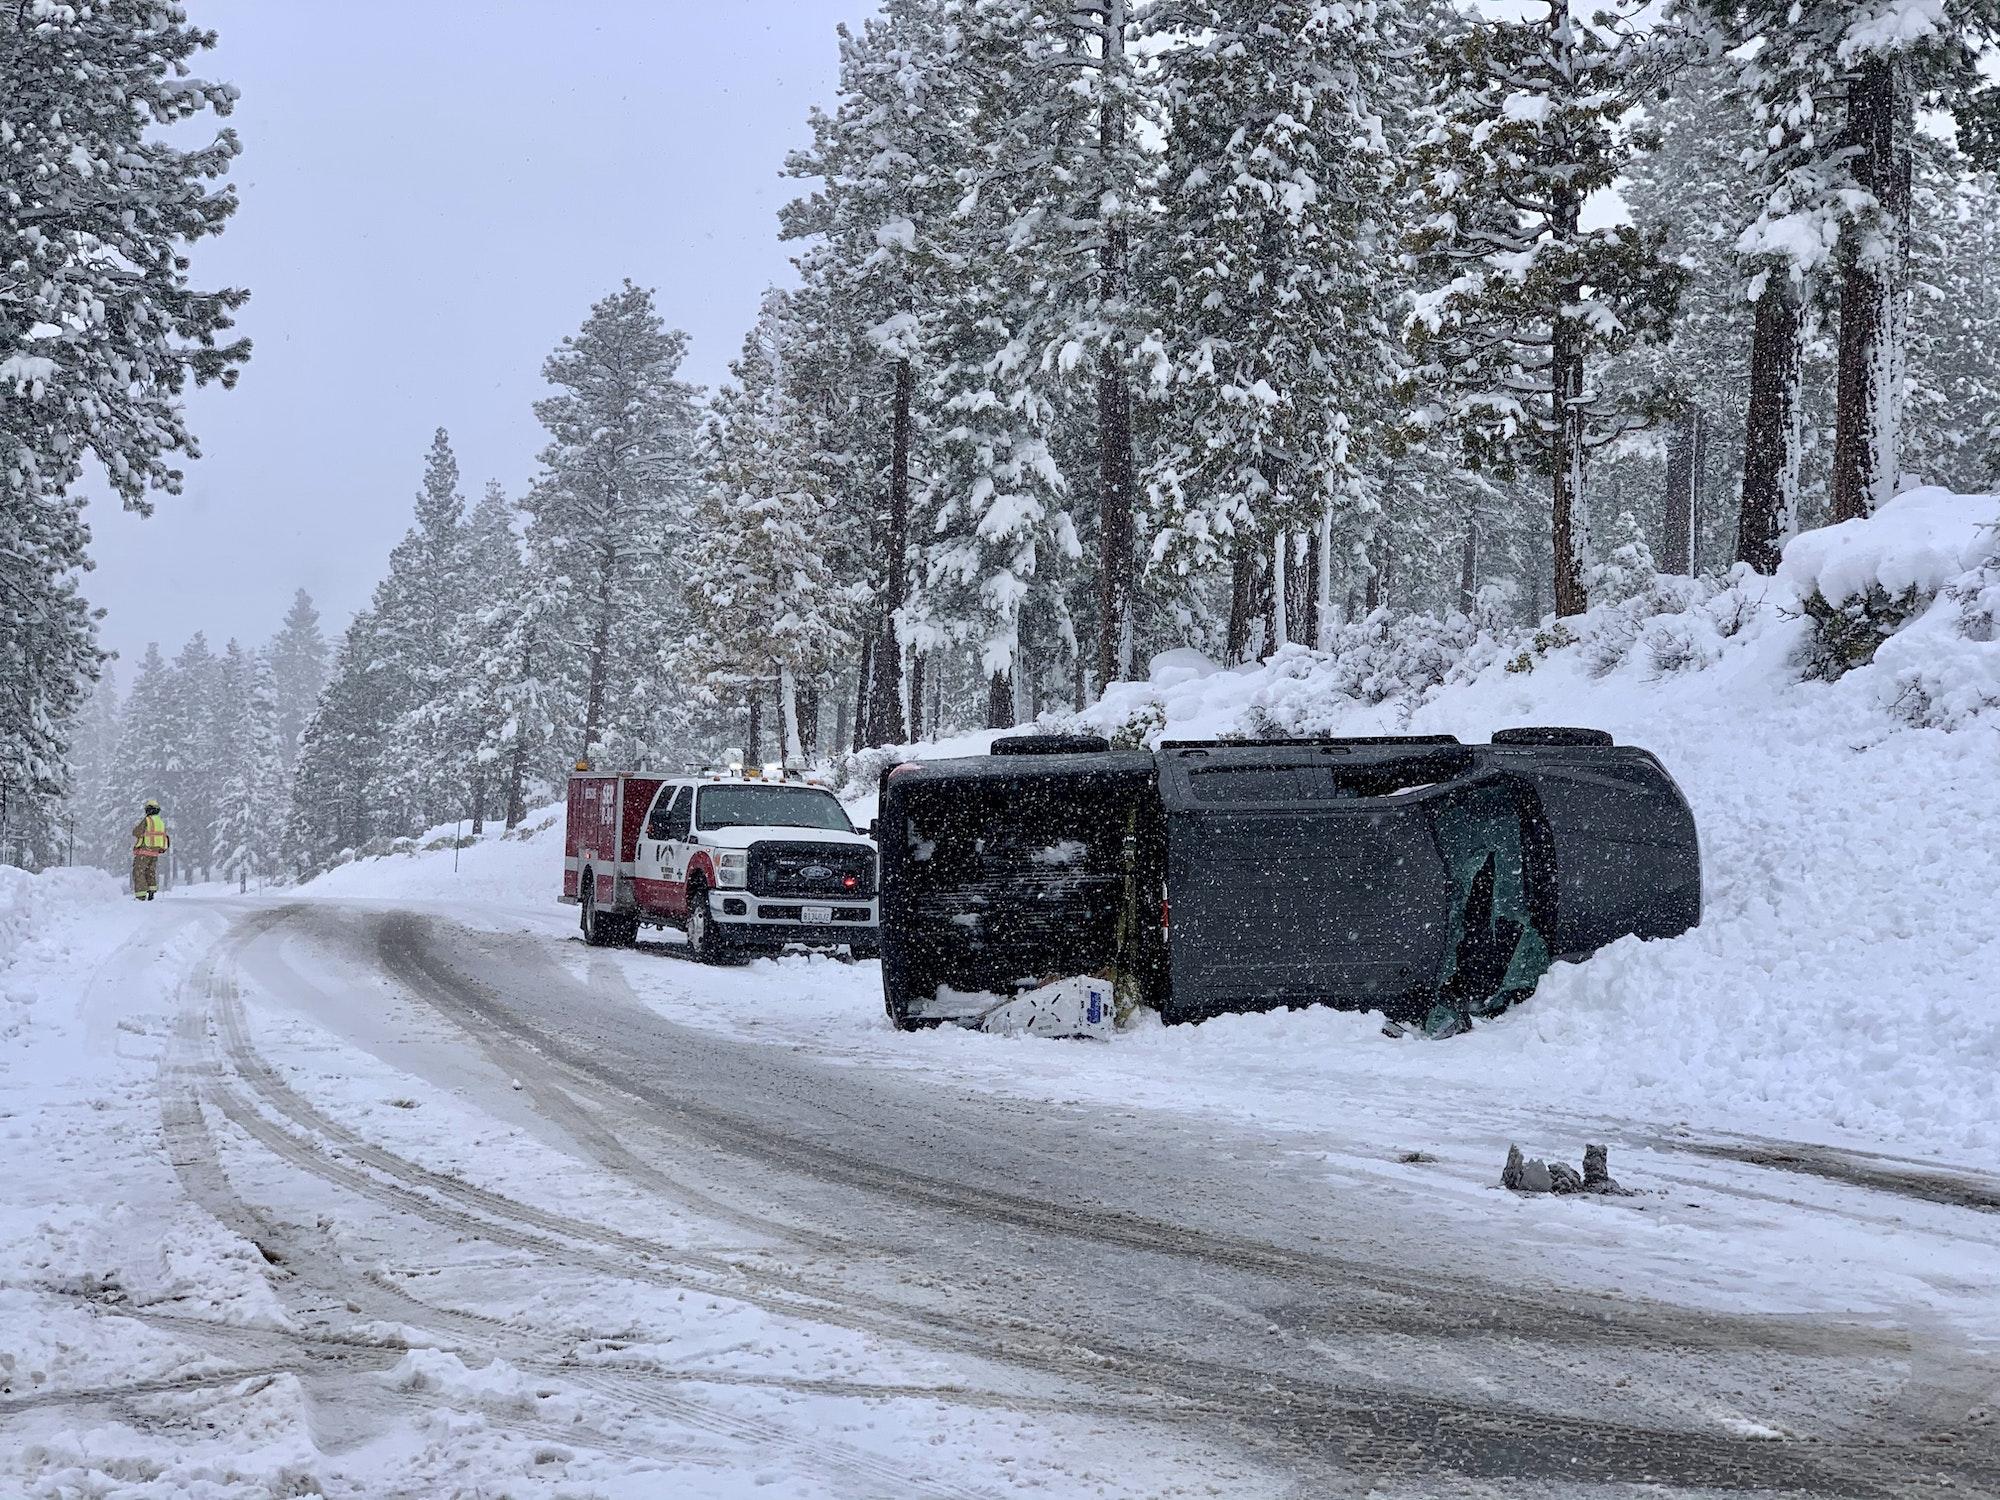 Snowy black truck rollover on Highway 89 N